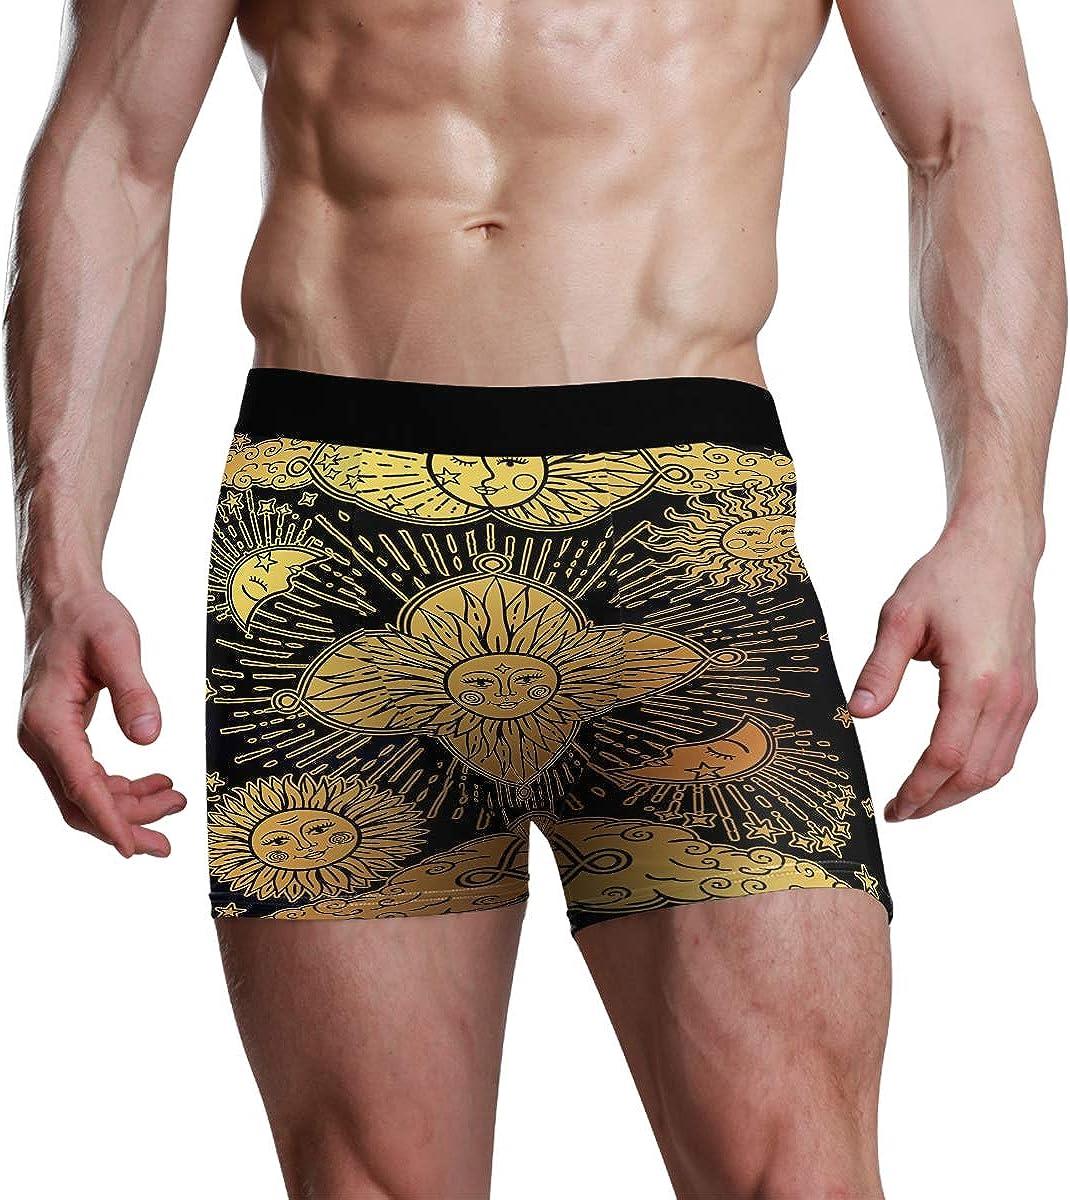 Mens Boxer Briefs Sun Moon and Stars Low Rise Trunks Underwear Breathable Bikini Boys